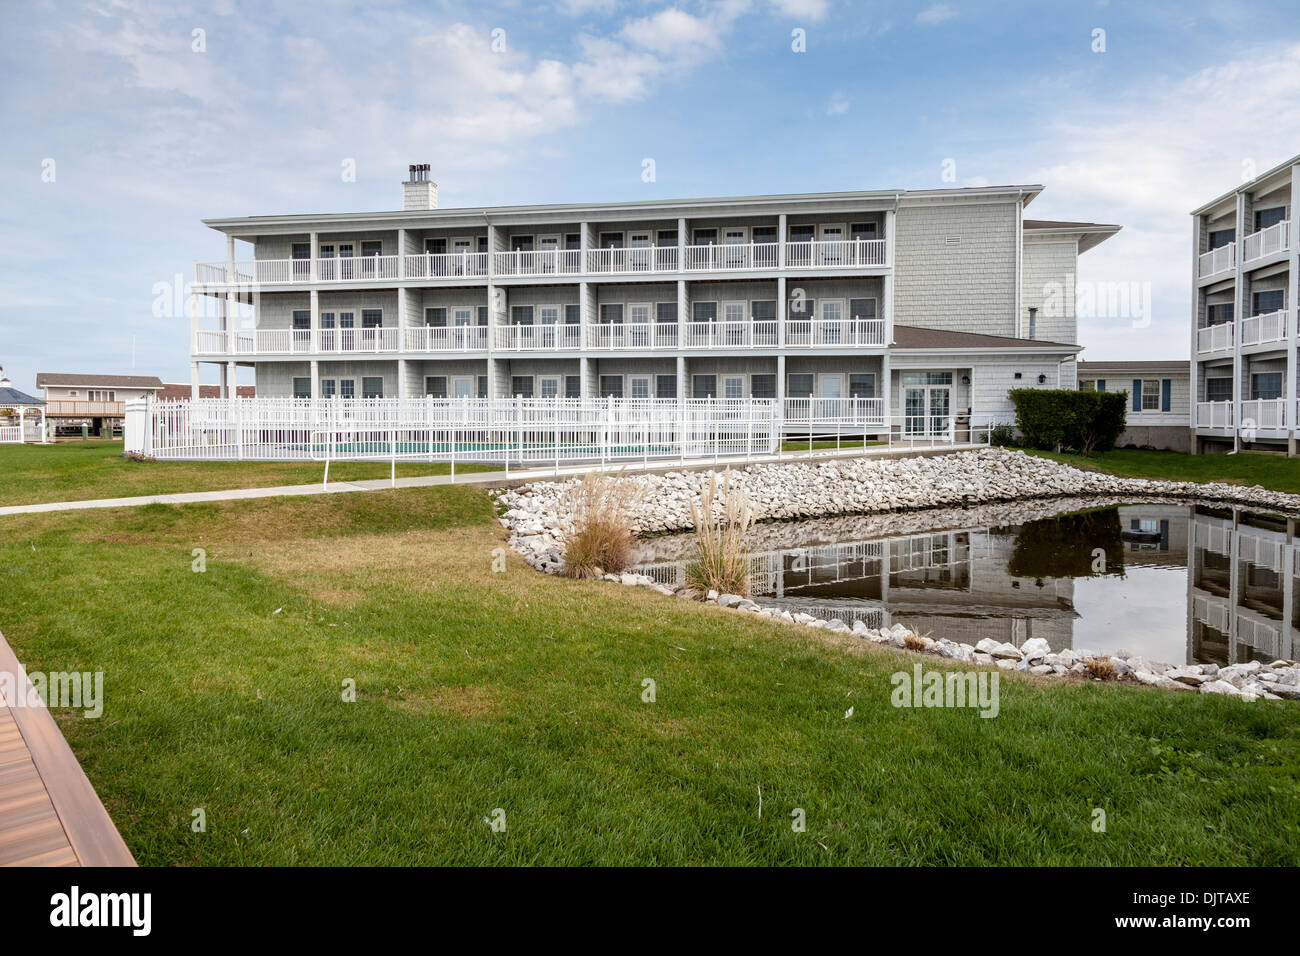 Vacation lodging and resorts on Chincoteague Island - Stock Image